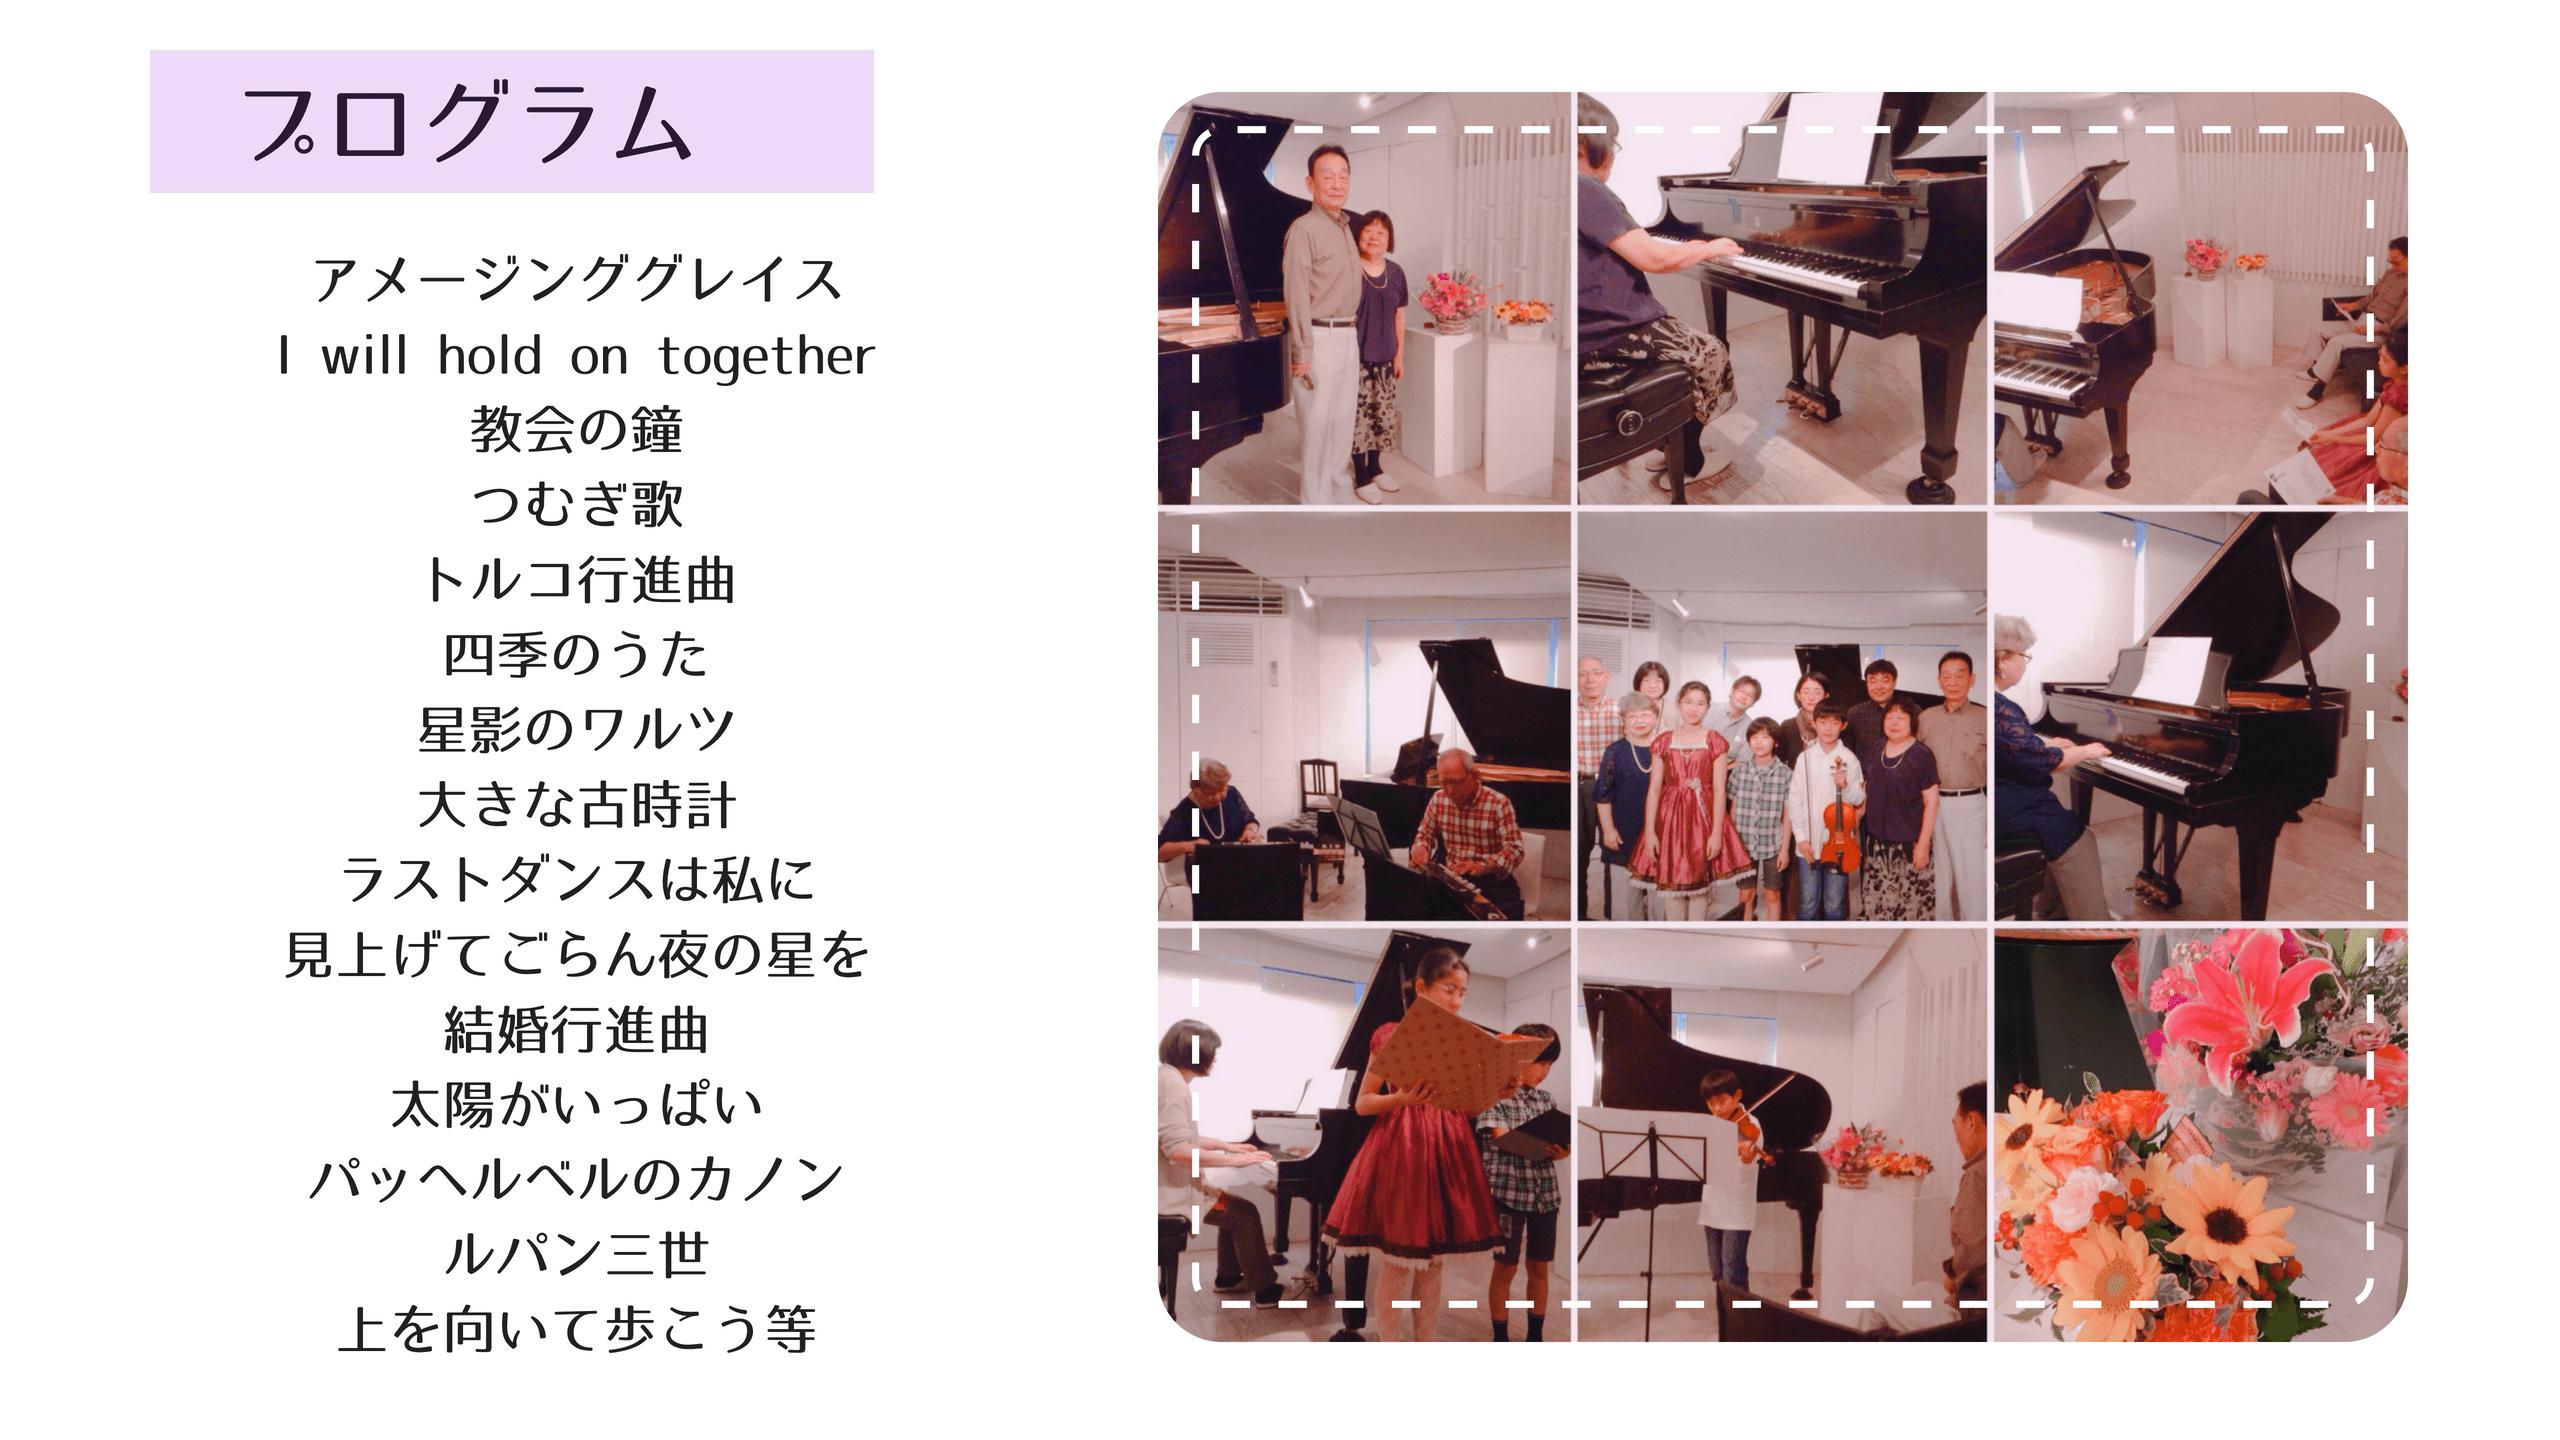 pianoreciope/otoaniversary-1